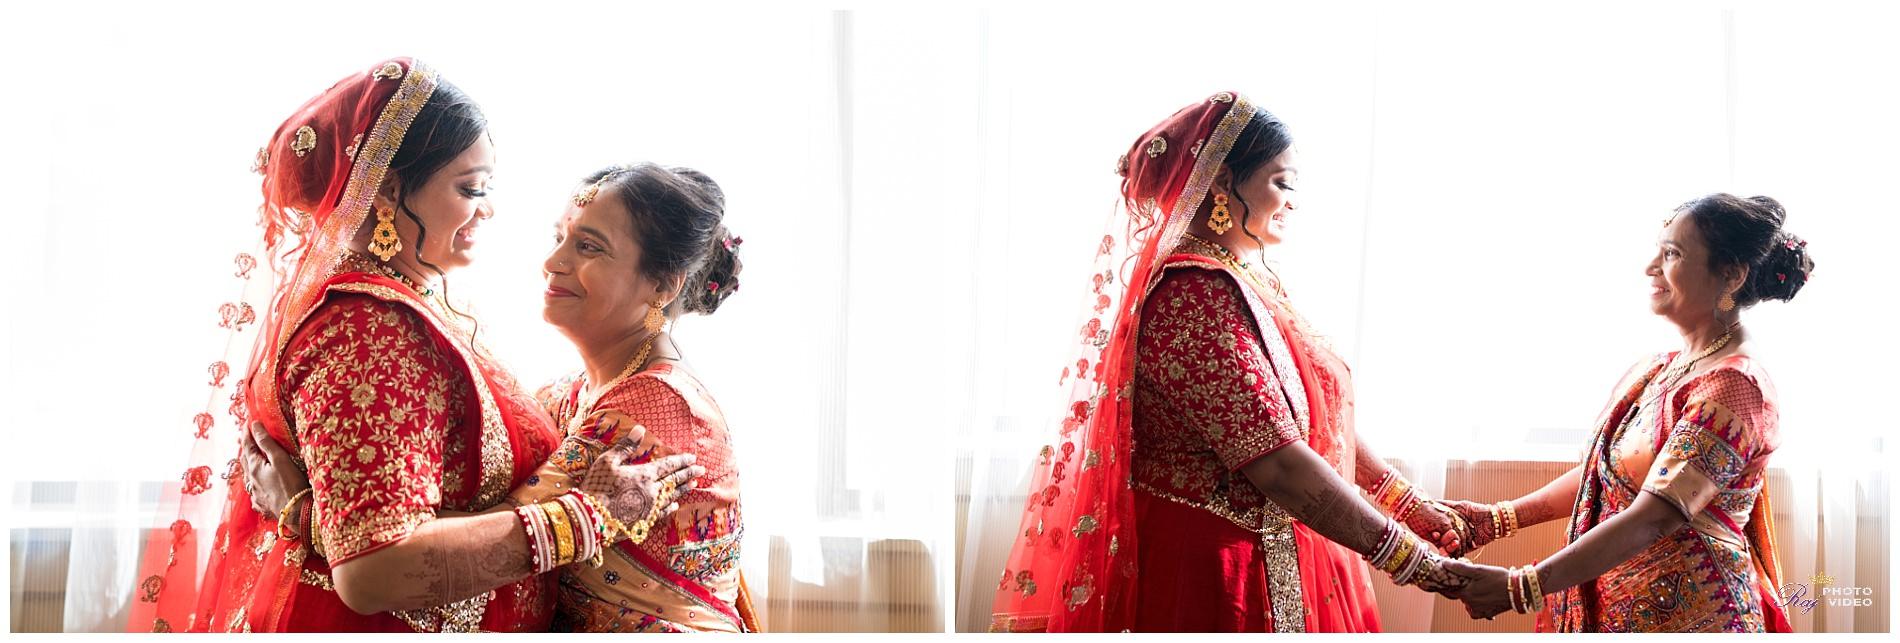 doubletree-by-hilton-hotel-wilmington-de-wedding-krishna-ritesh-43.jpg